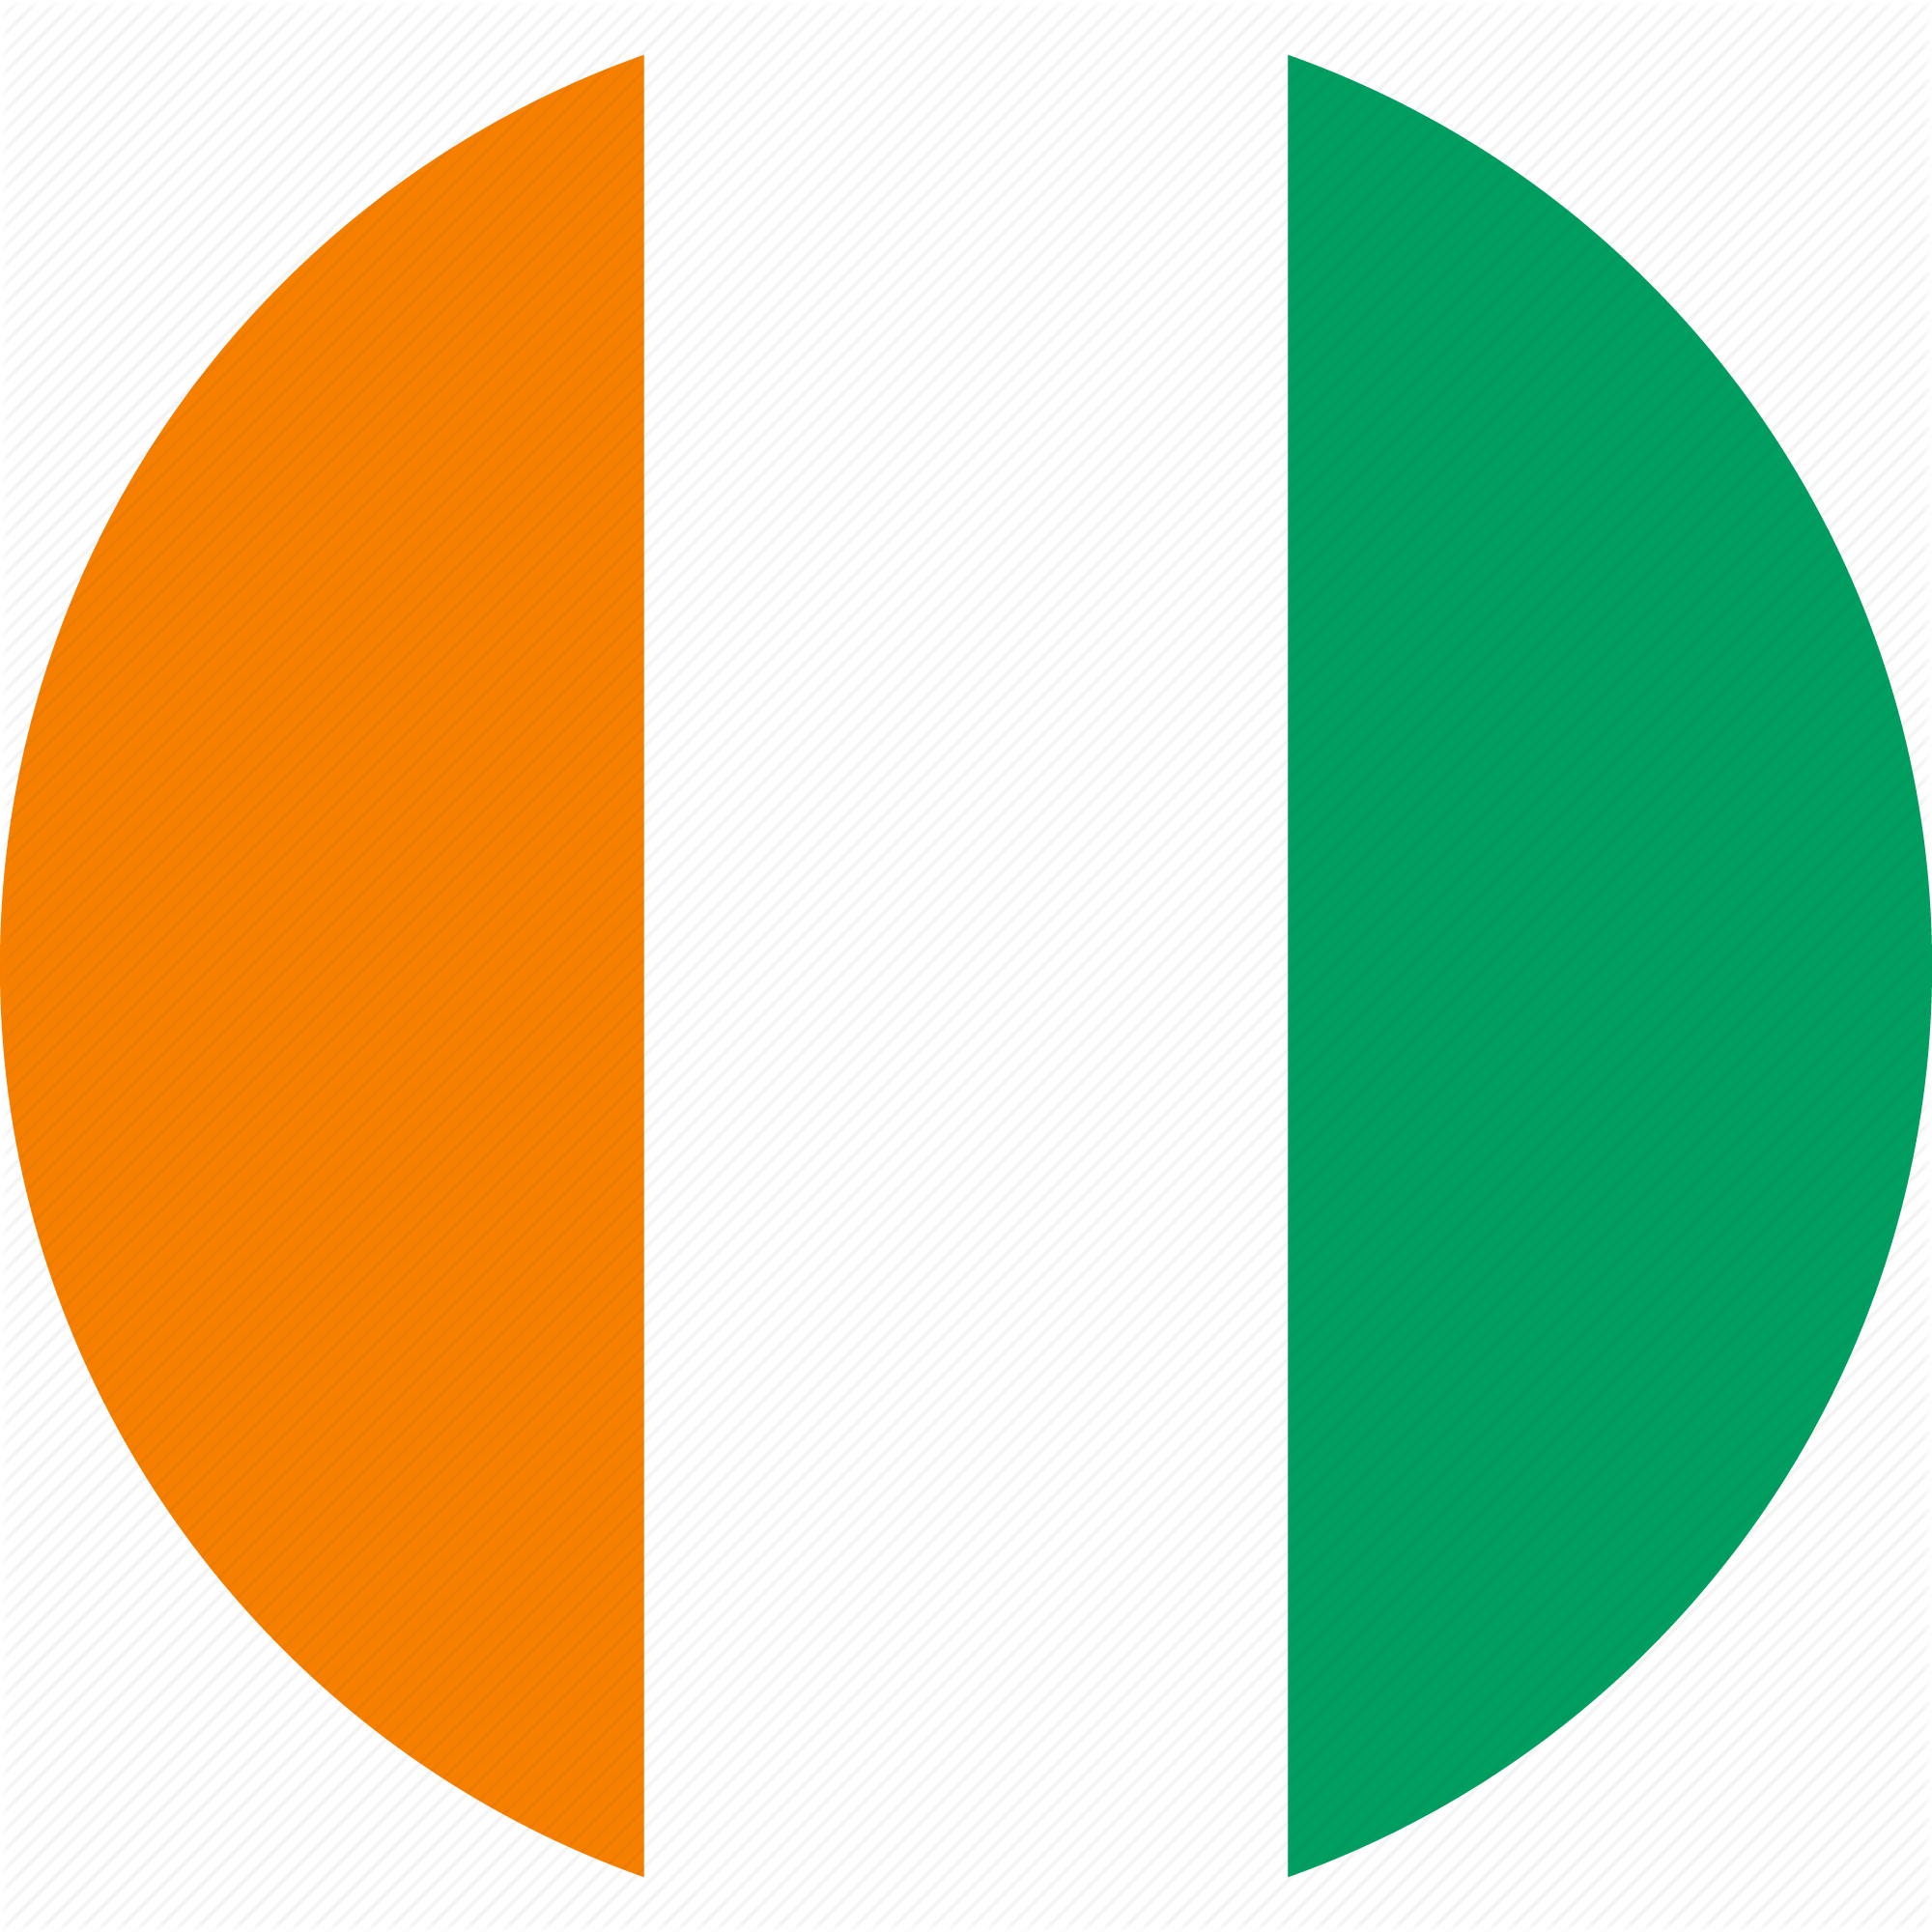 Ivory Coast flags